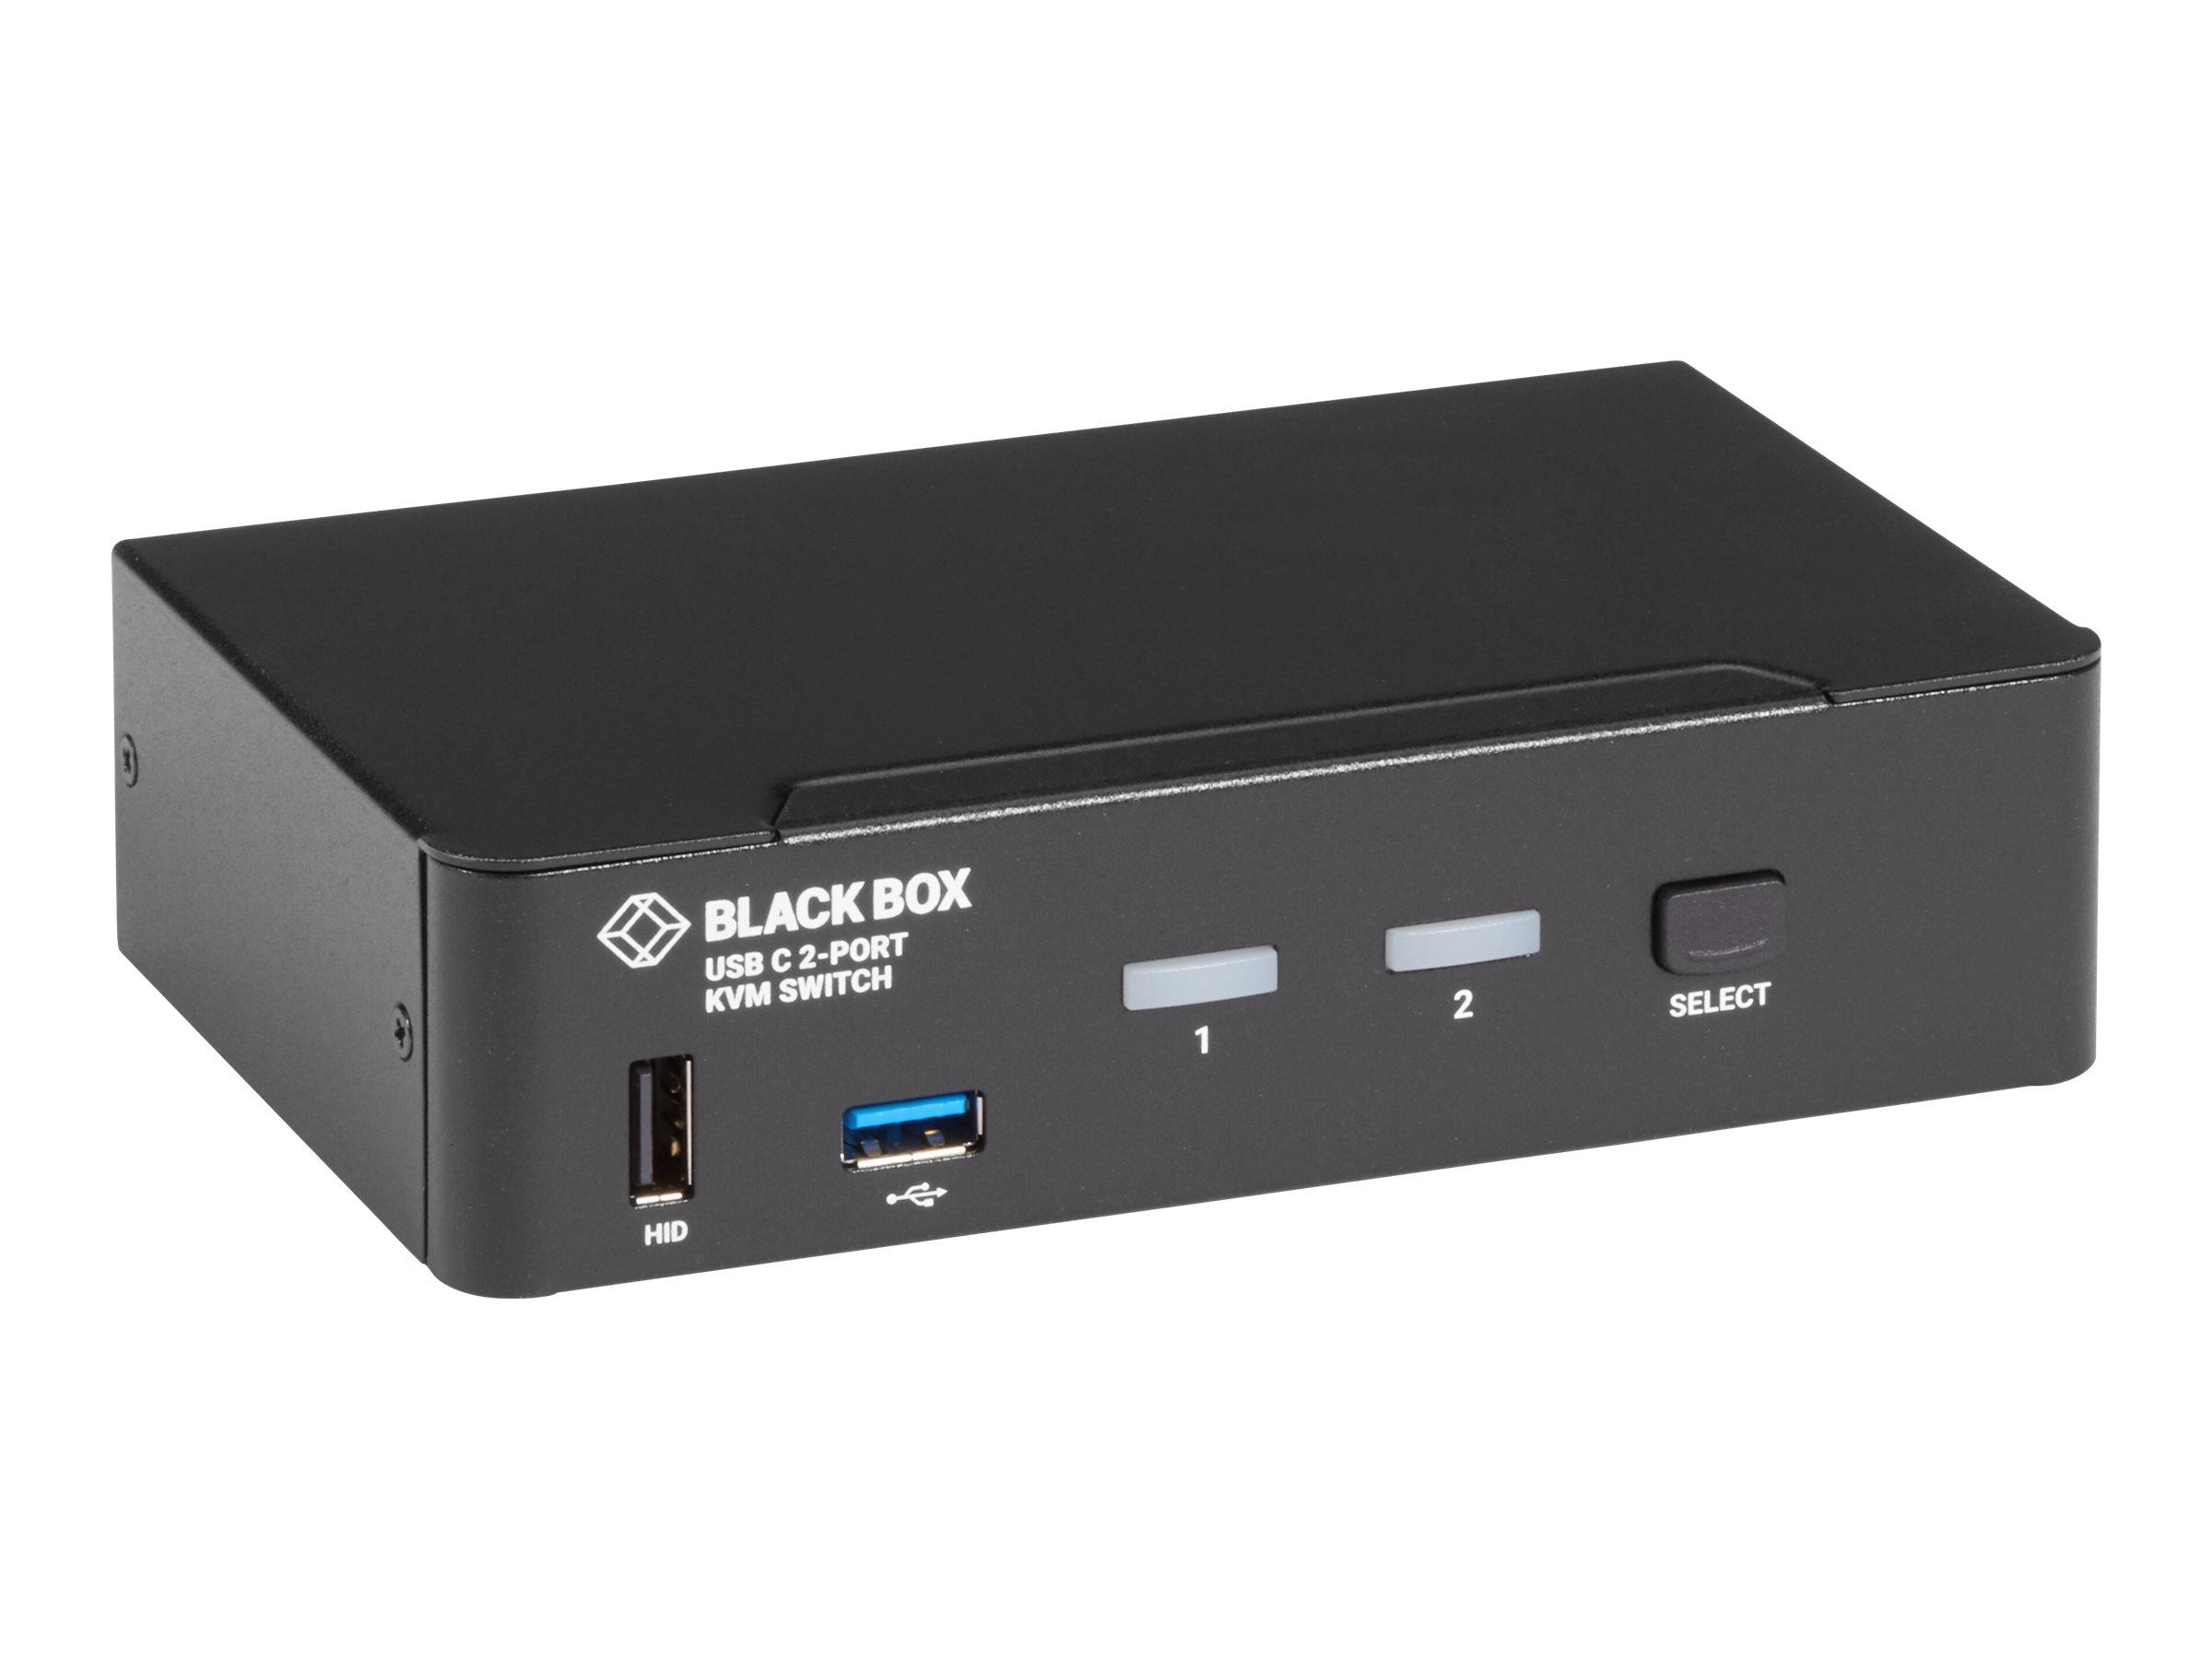 Black Box USB-C 4K KVM Switch, 2-Port - KVM-Switch - 2 lokale Benutzer - Desktop - TAA-konform